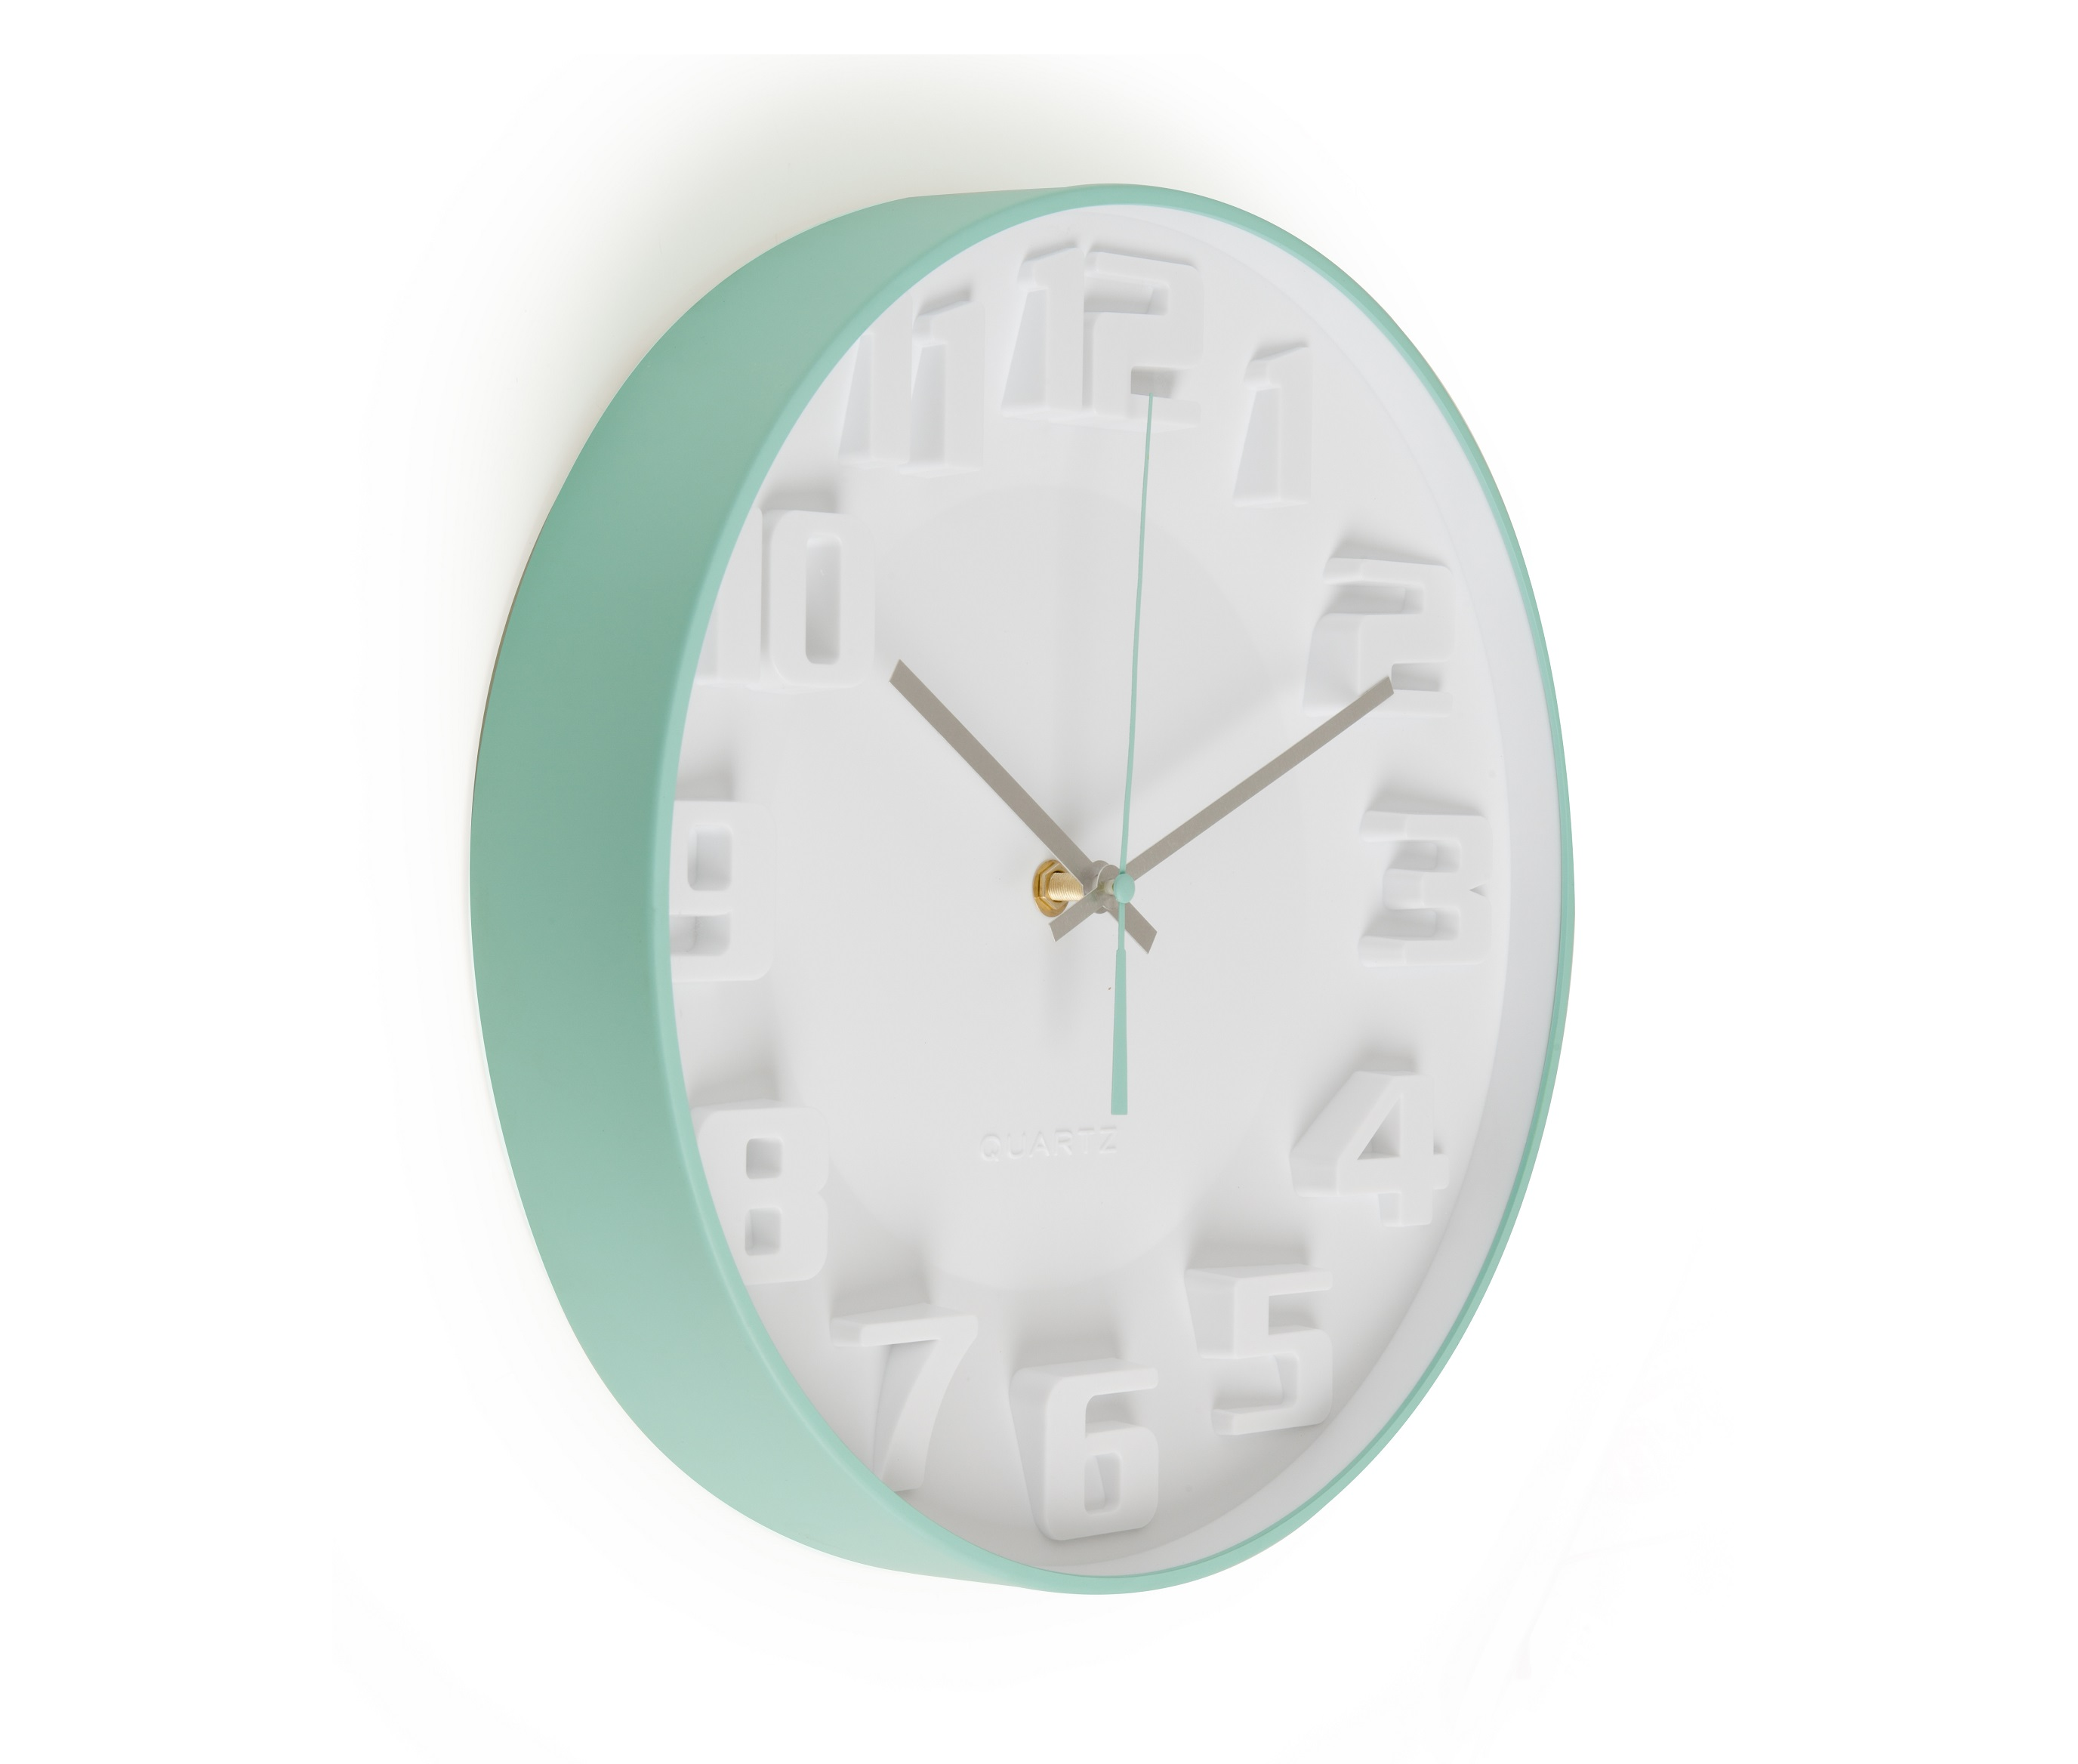 Настенные часы МиролюбиеНастенные часы<br>&amp;lt;div&amp;gt;Механизм: кварцевый&amp;lt;/div&amp;gt;&amp;lt;div&amp;gt;Материал: абс-пластик, стекло&amp;lt;/div&amp;gt;&amp;lt;div&amp;gt;&amp;lt;br&amp;gt;&amp;lt;/div&amp;gt;<br><br>Material: Пластик<br>Length см: None<br>Width см: None<br>Depth см: 7<br>Height см: None<br>Diameter см: 37